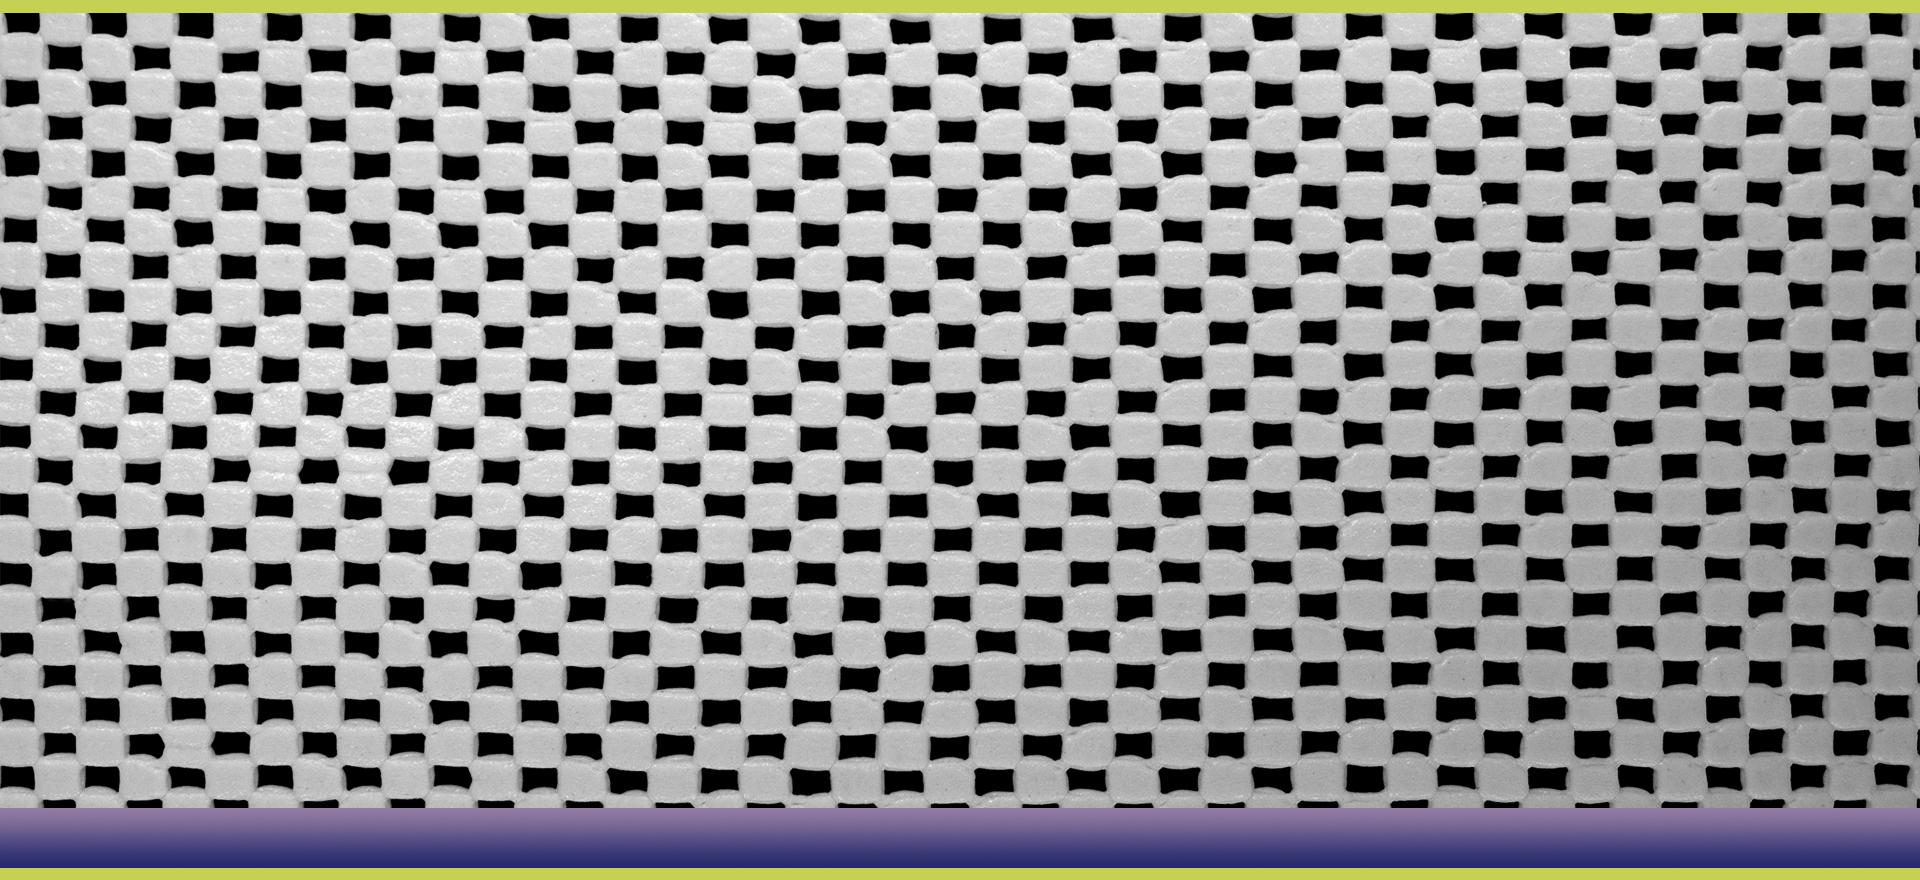 WaffleGrip Background